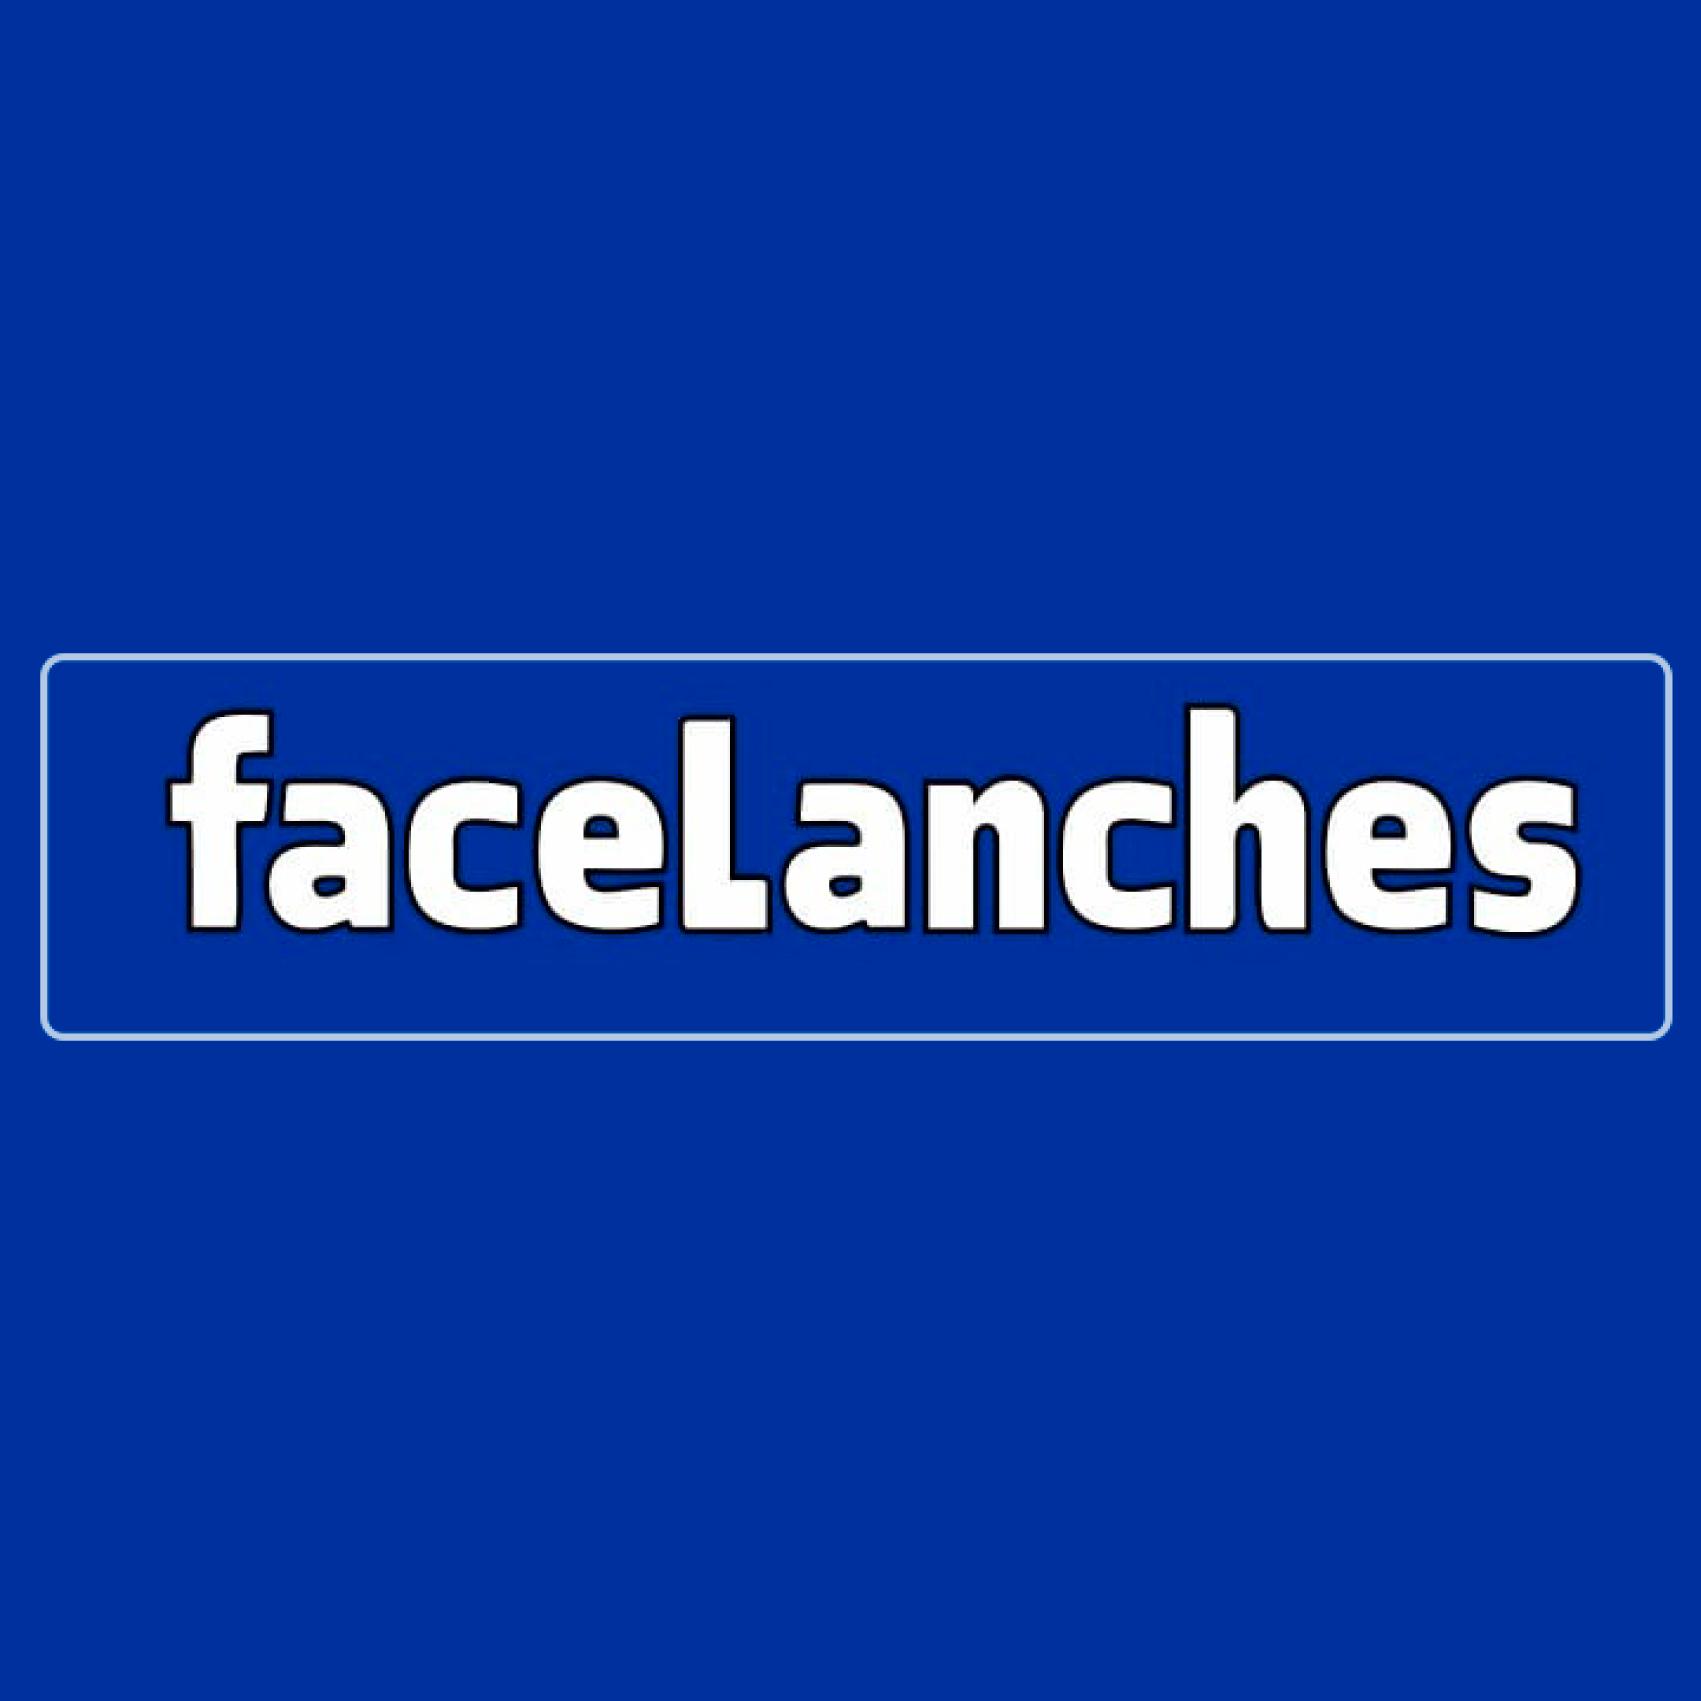 Facelanches